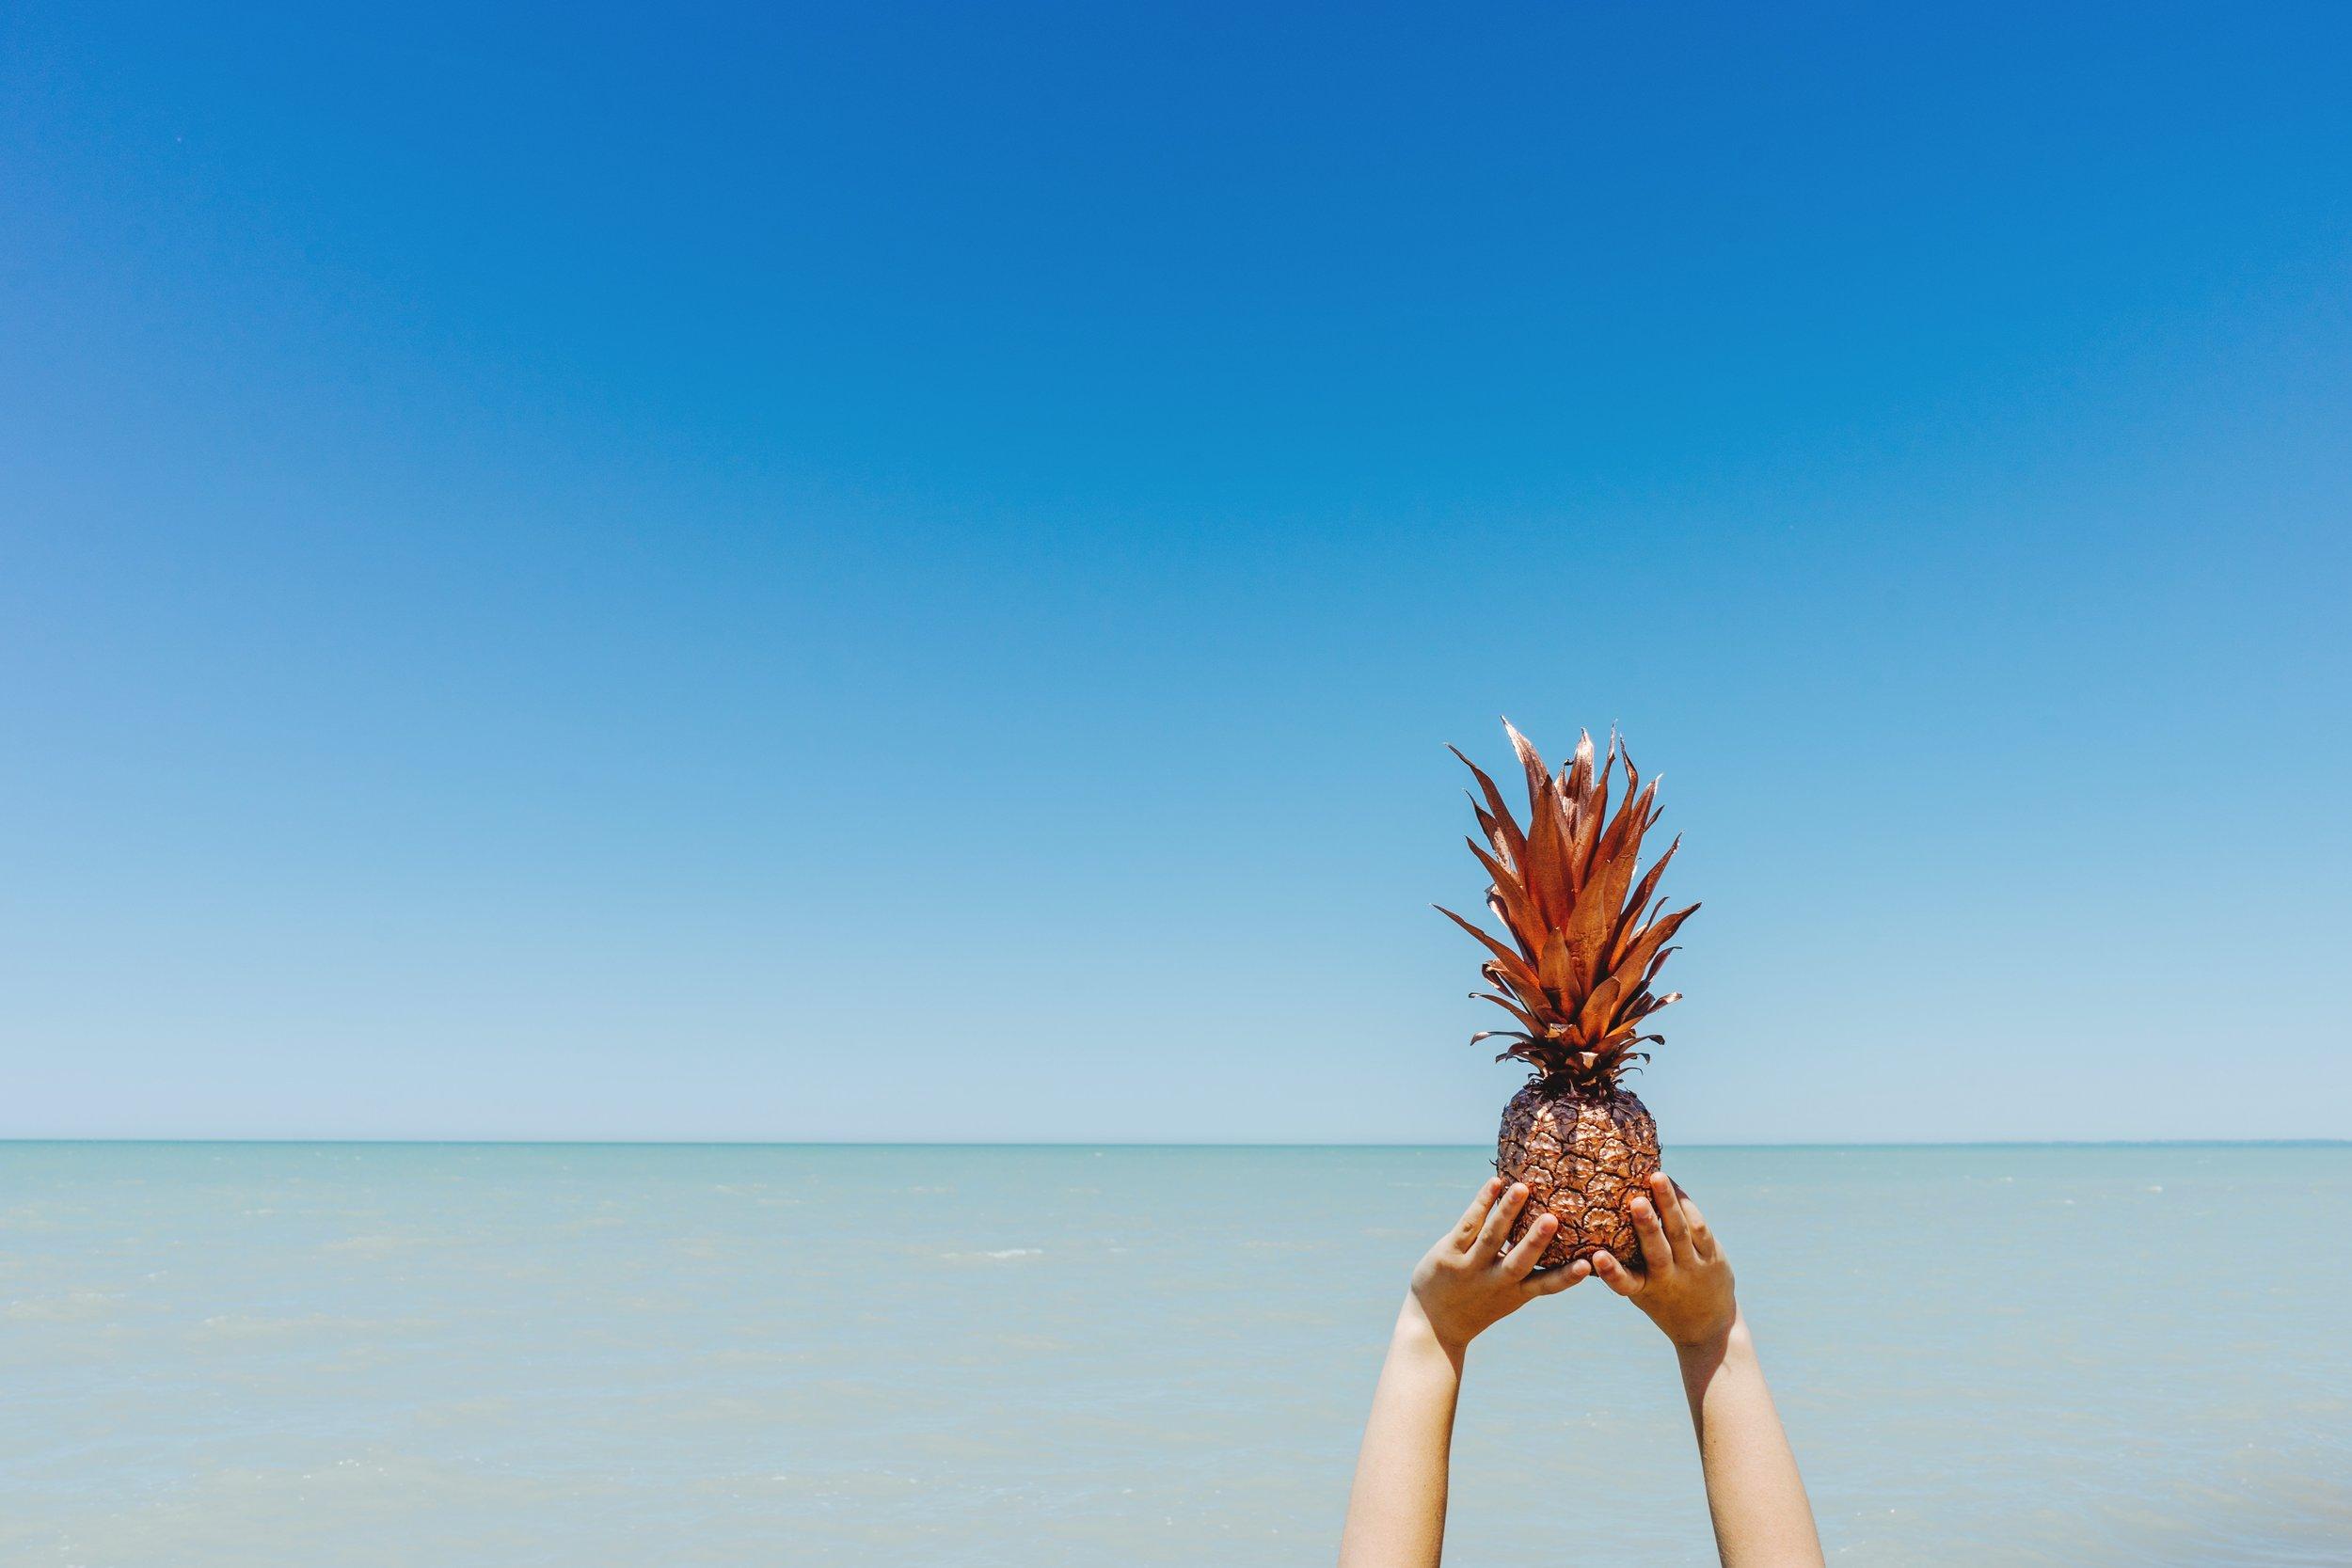 pineapple-supply-co-120785.jpg